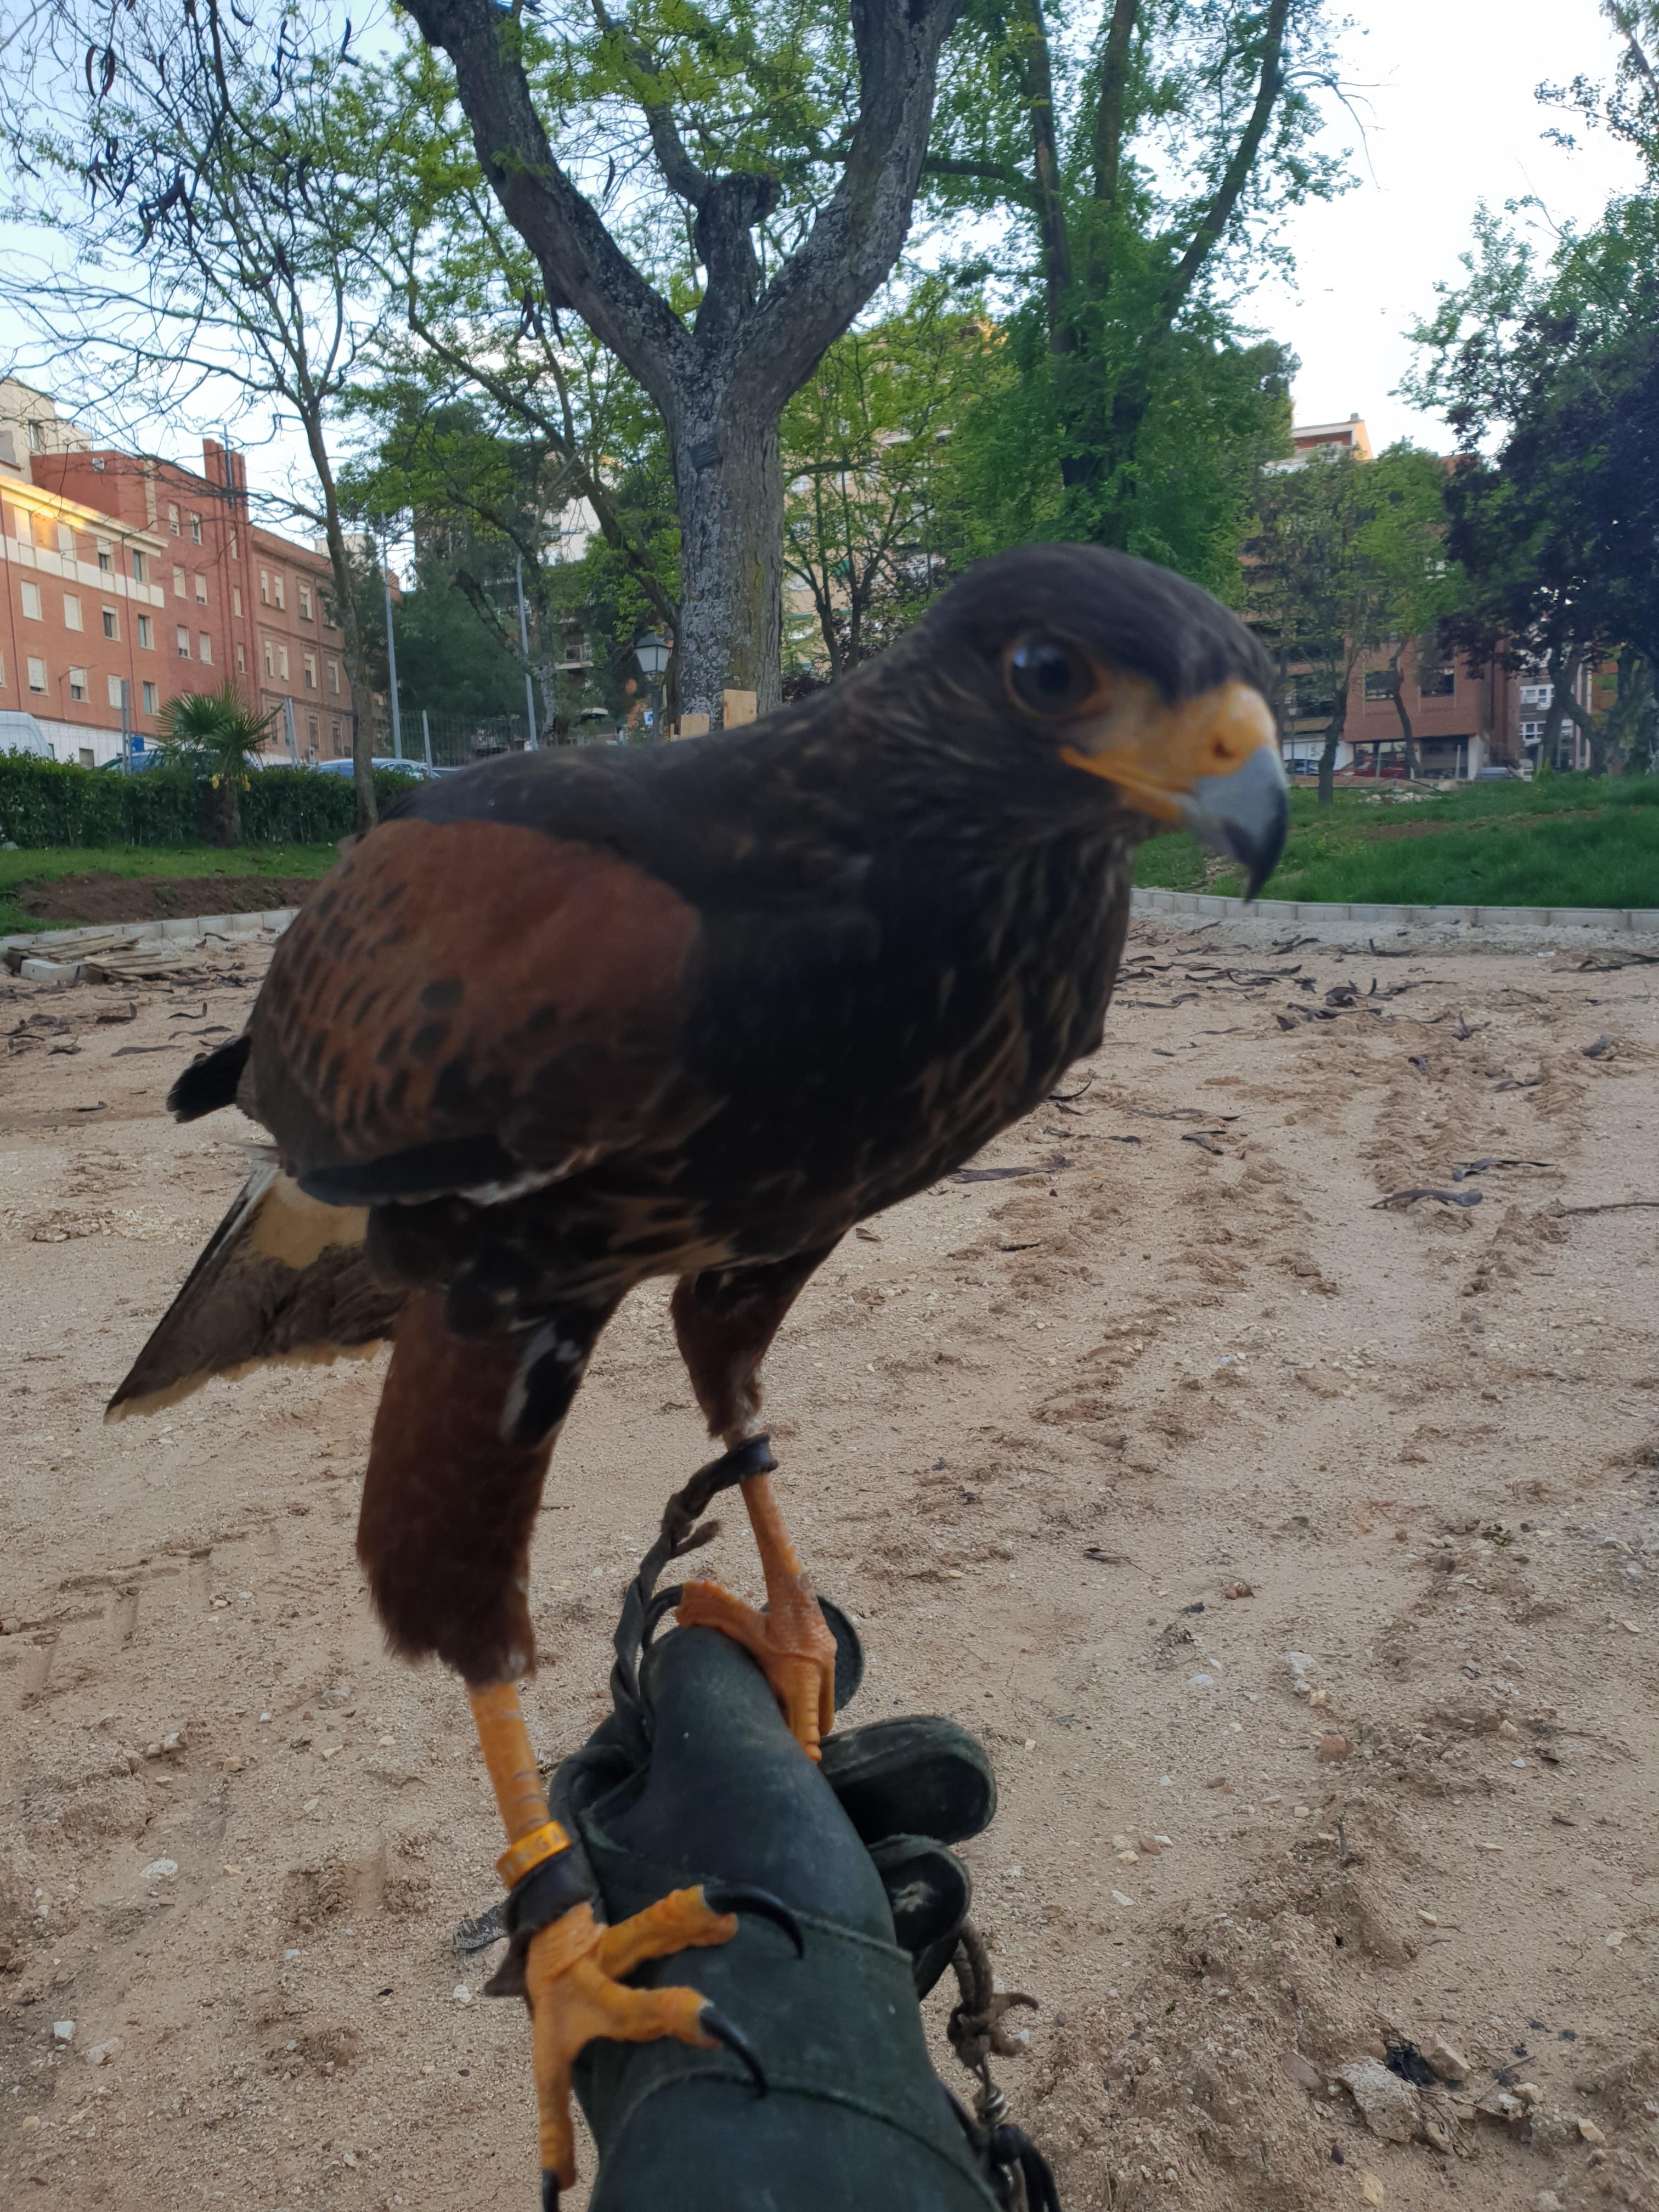 Vuelos  disuasorios con aves rapaces  para ahuyentar a las palomas